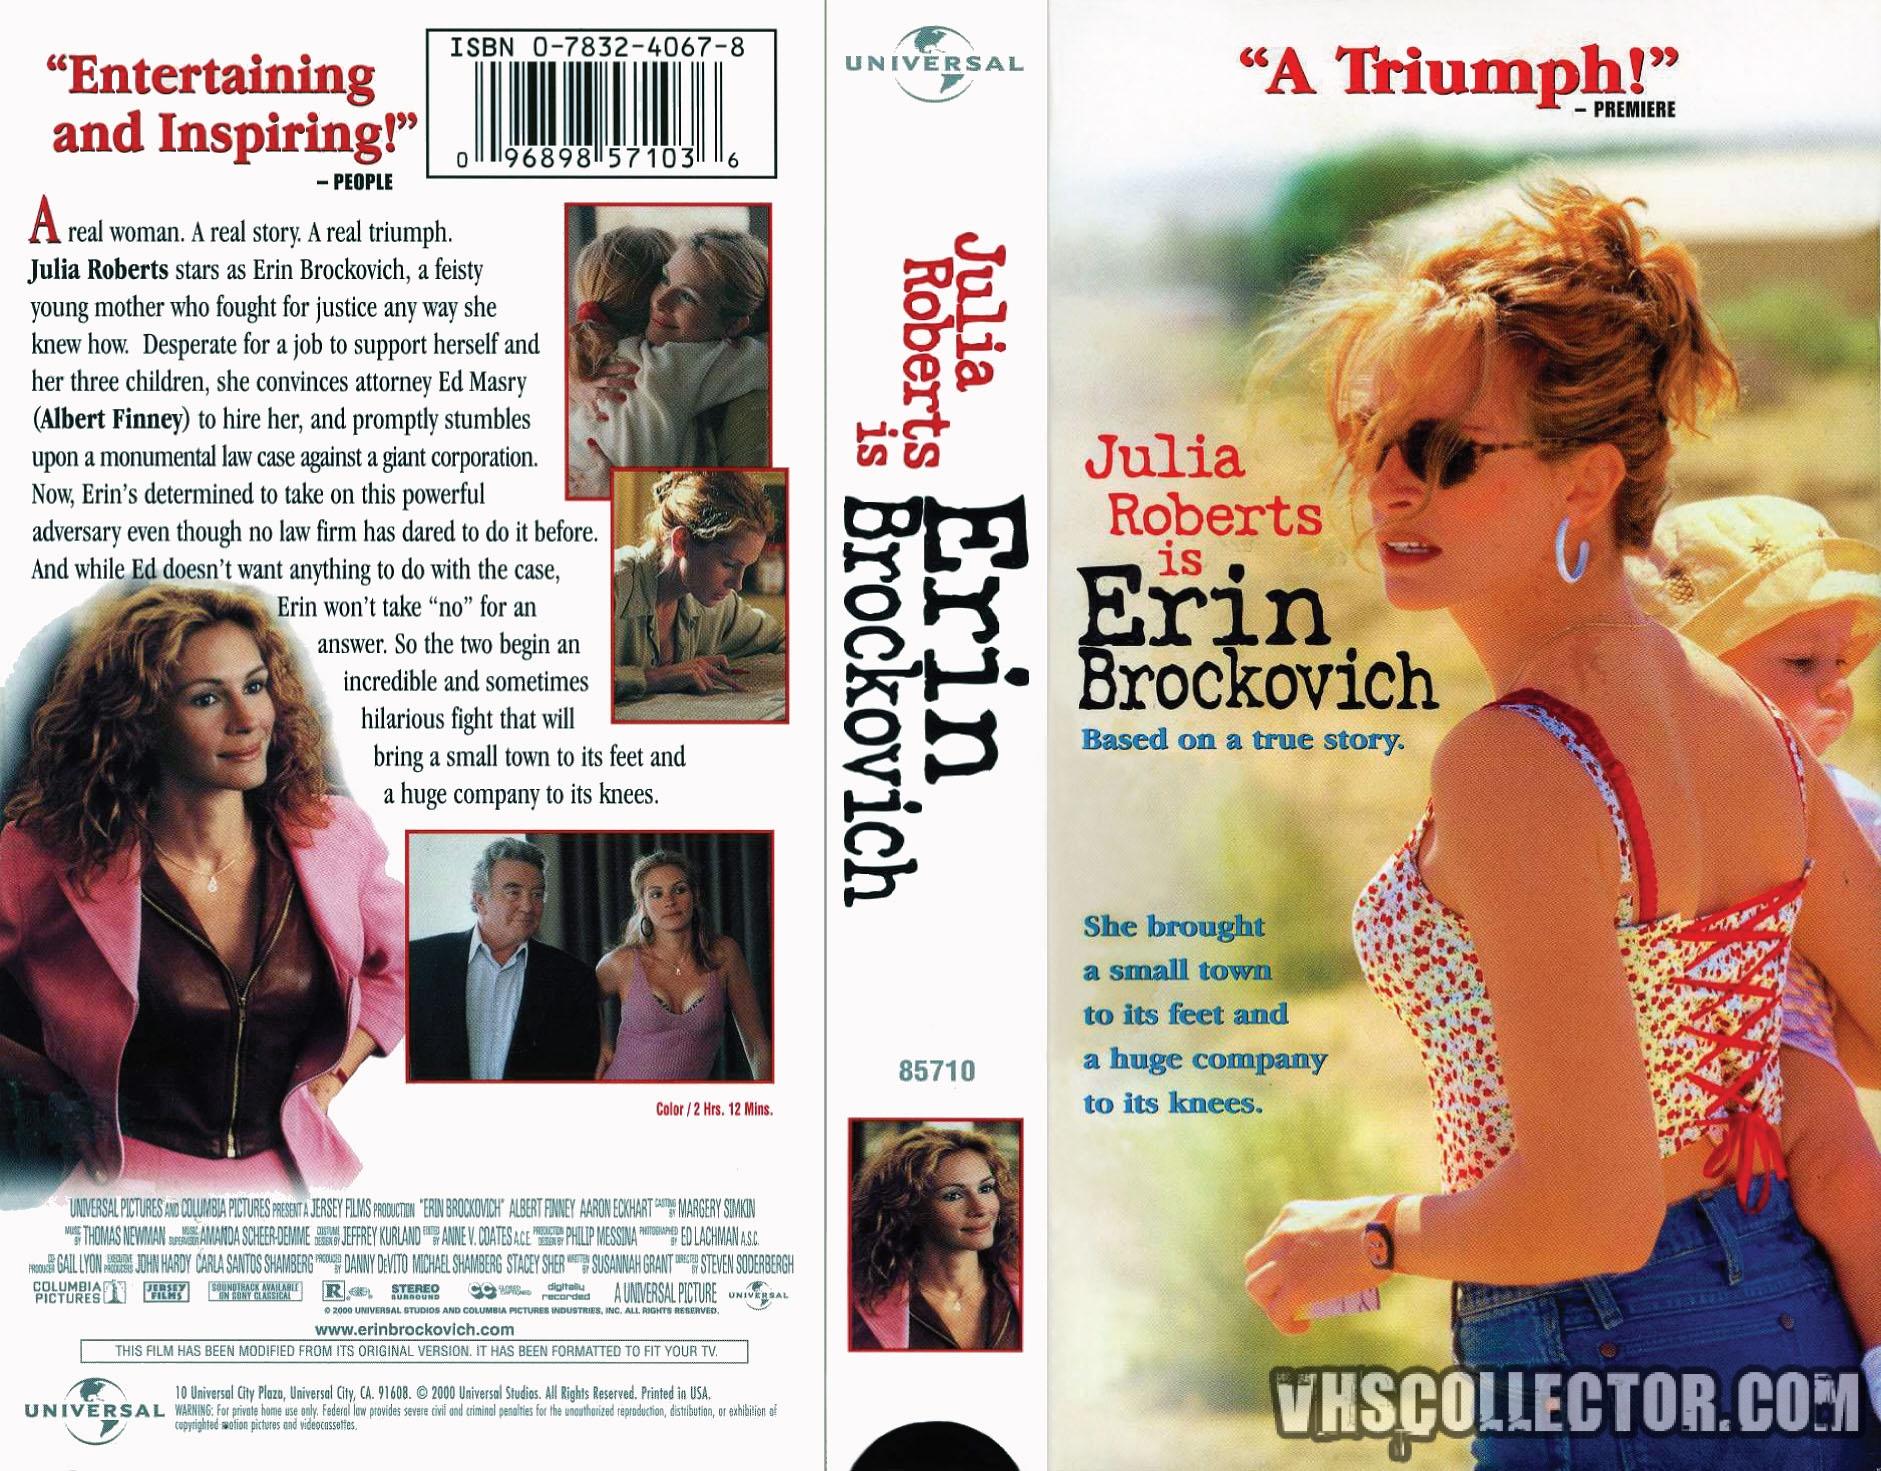 Erin Brockovich Vhscollector Com